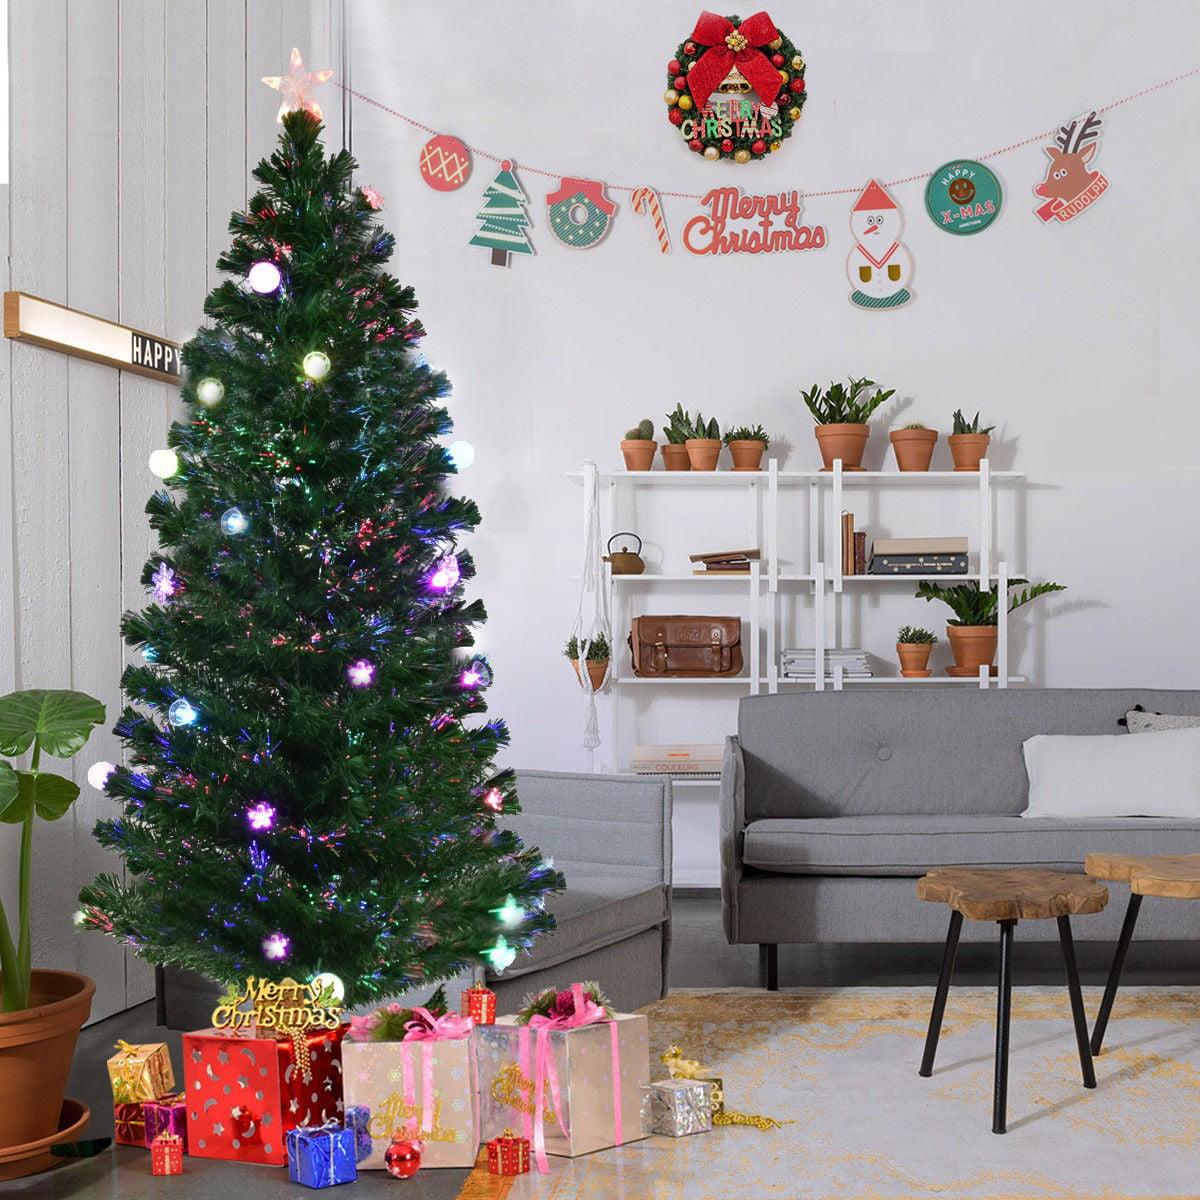 7 5 Fiber Optic Christmas Tree: 7.5' Fiber Optic Artificial Christmas Tree